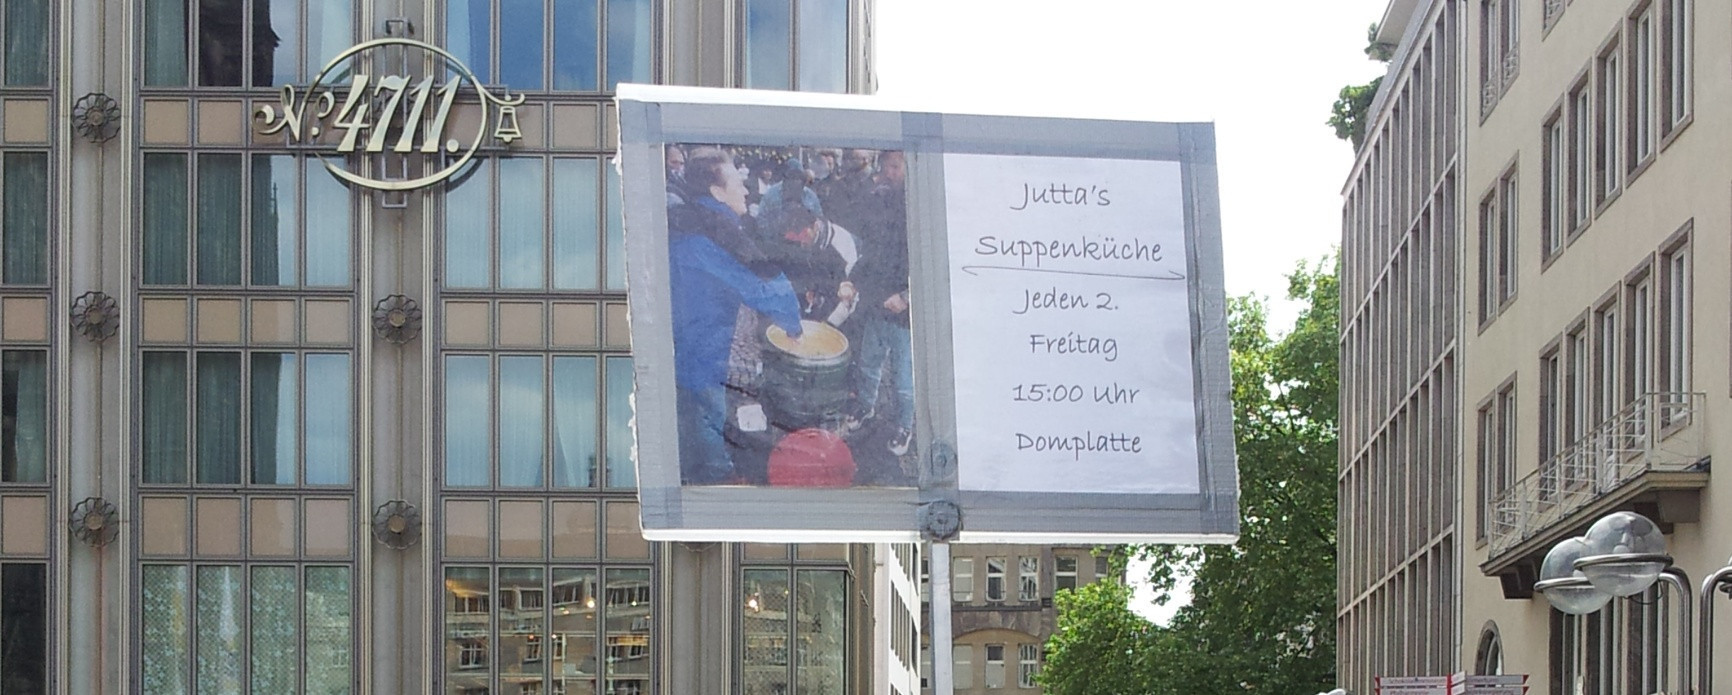 Juttas Suppenküche e. V. in Köln - seit 1997 - Vita Oeconomica